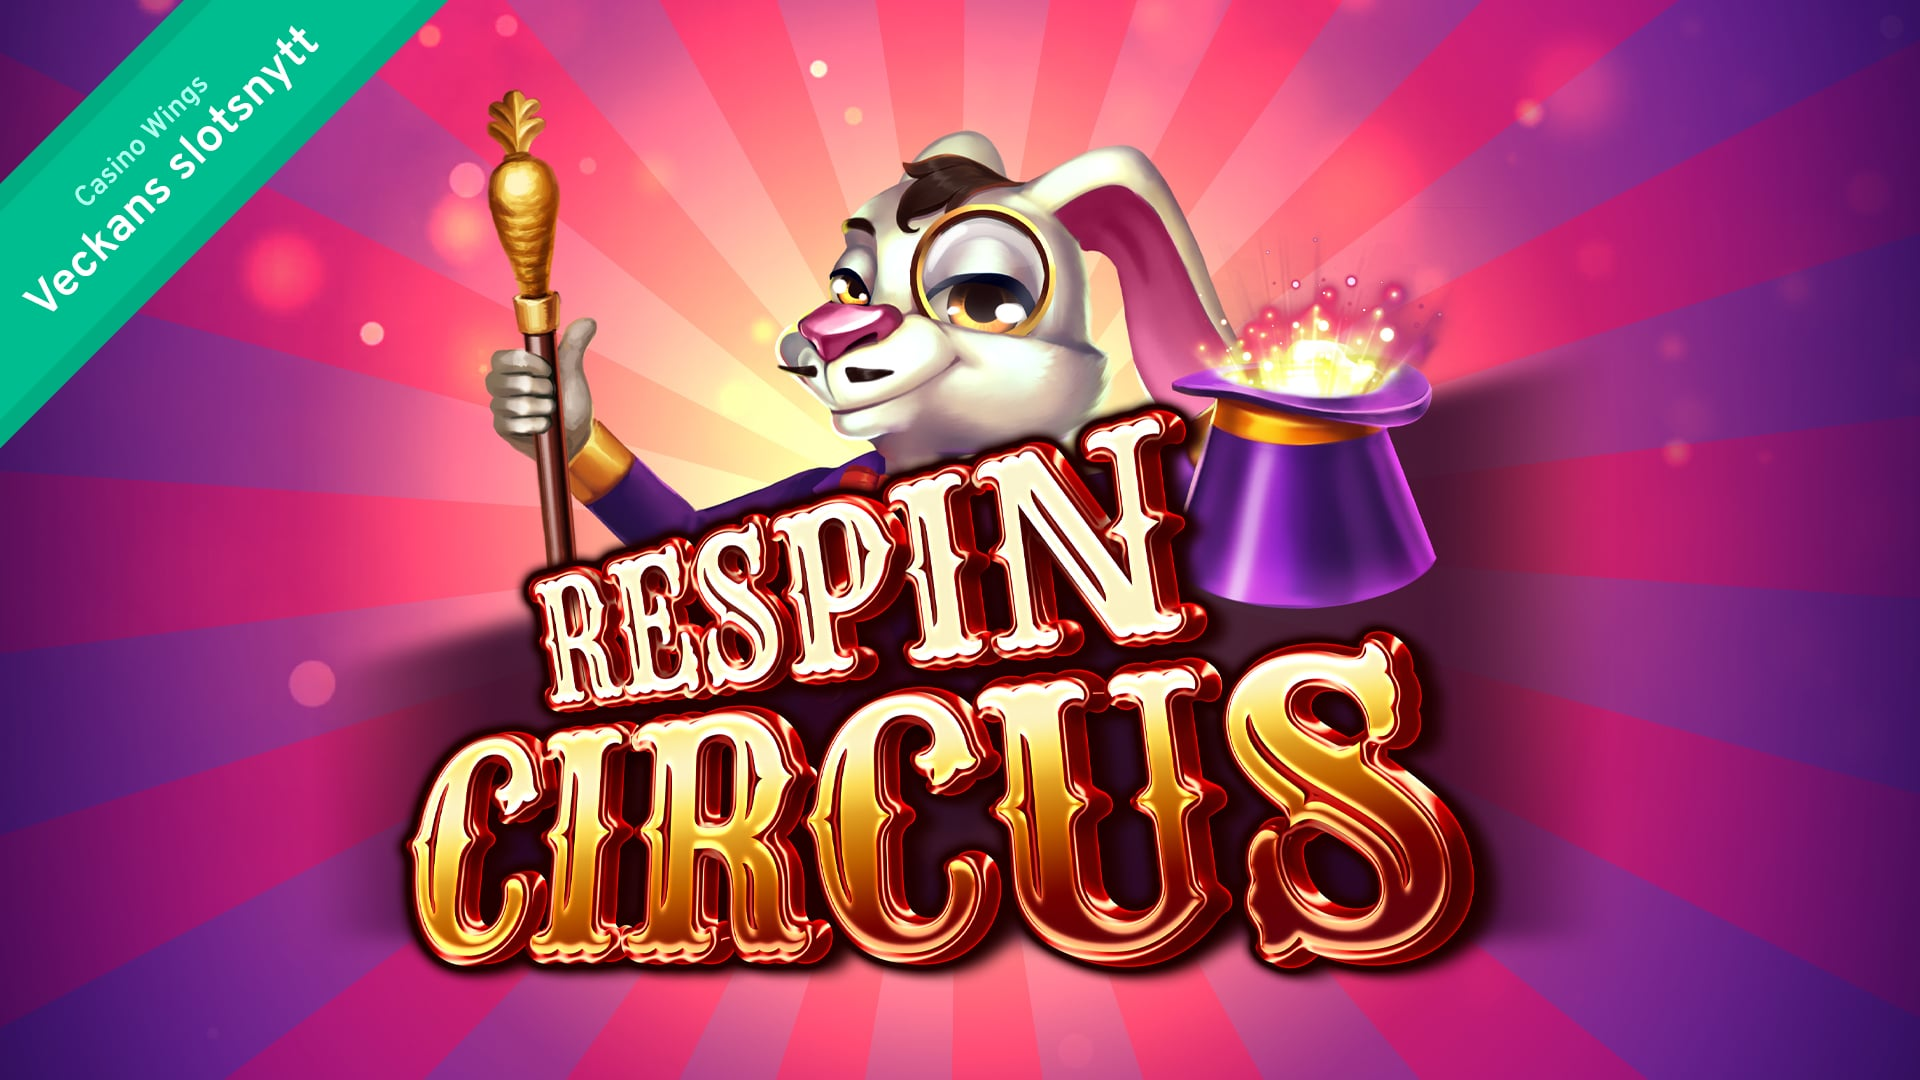 Veckans slotsnytt: Circus, antika Egyptien och Rich Wilde